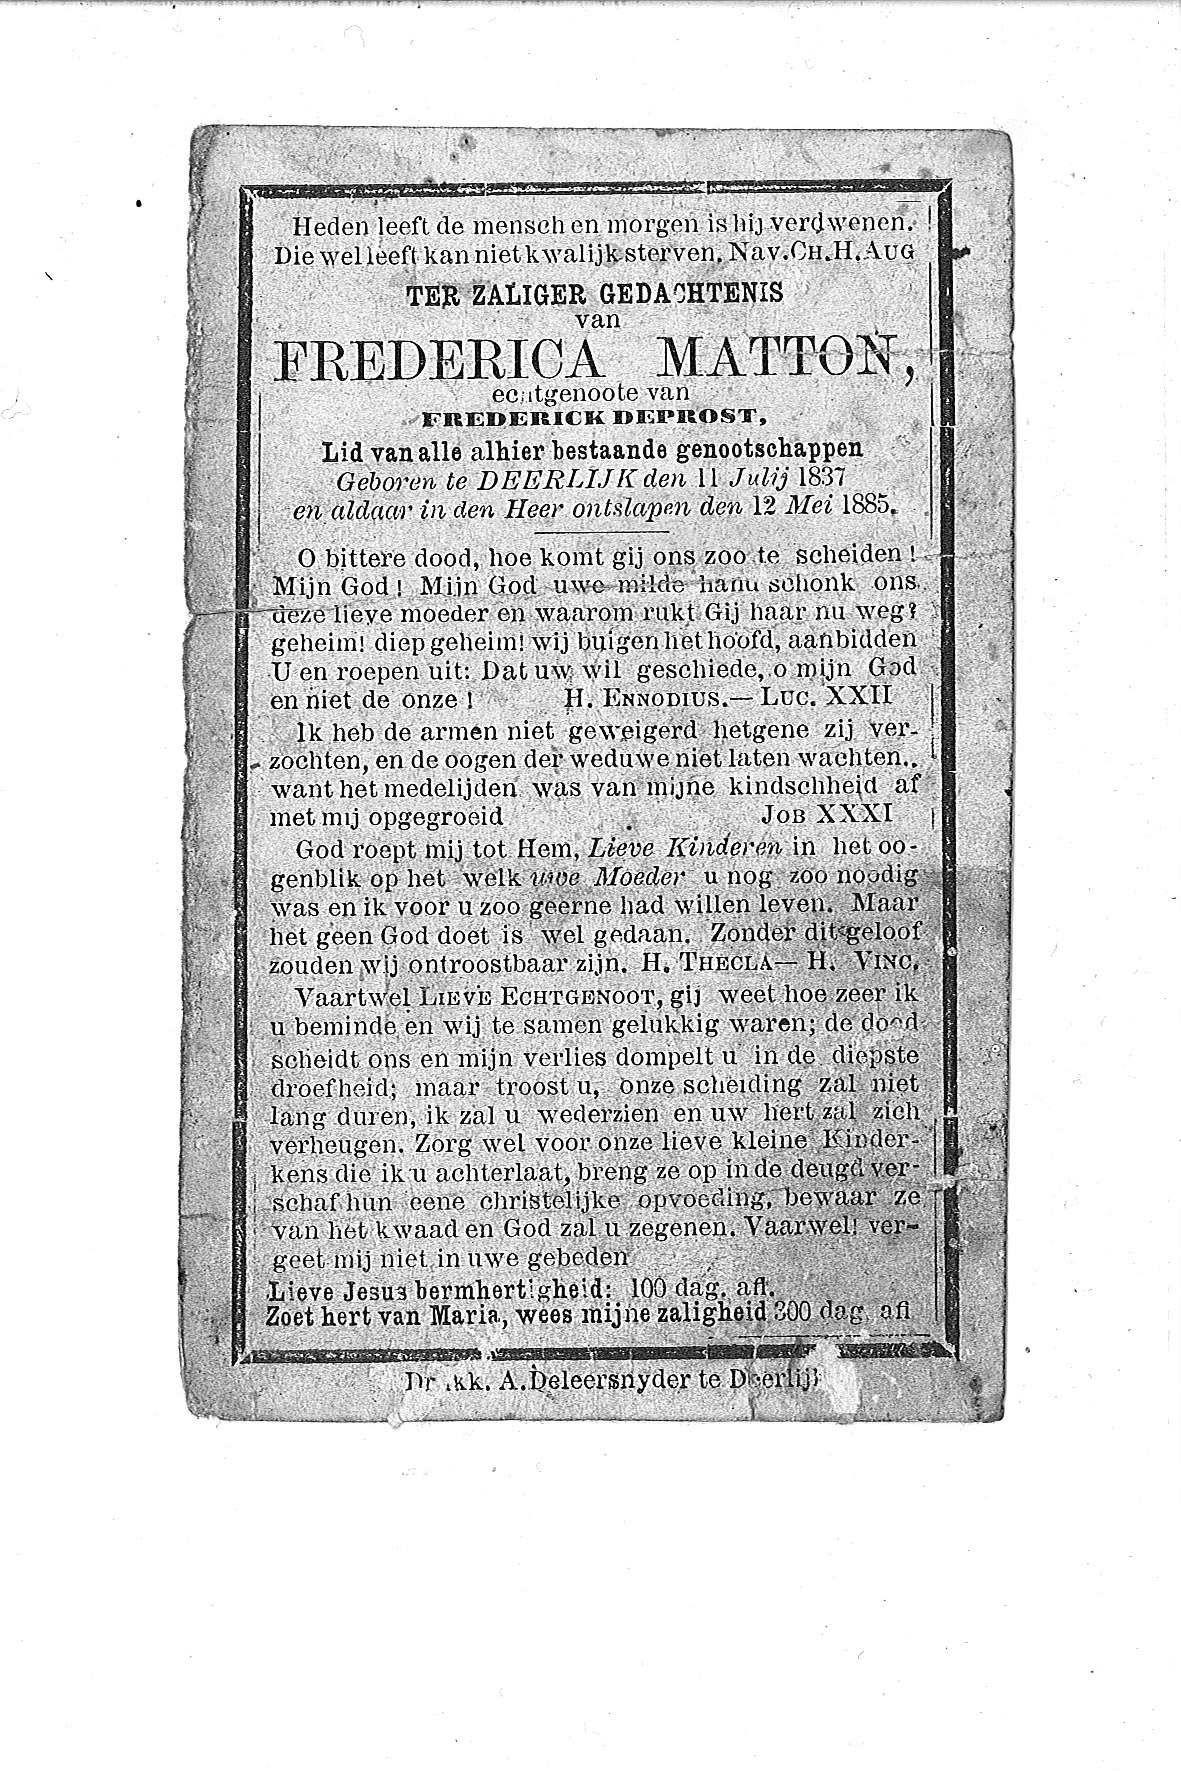 Frederica(1885)20100204132323_00019.jpg